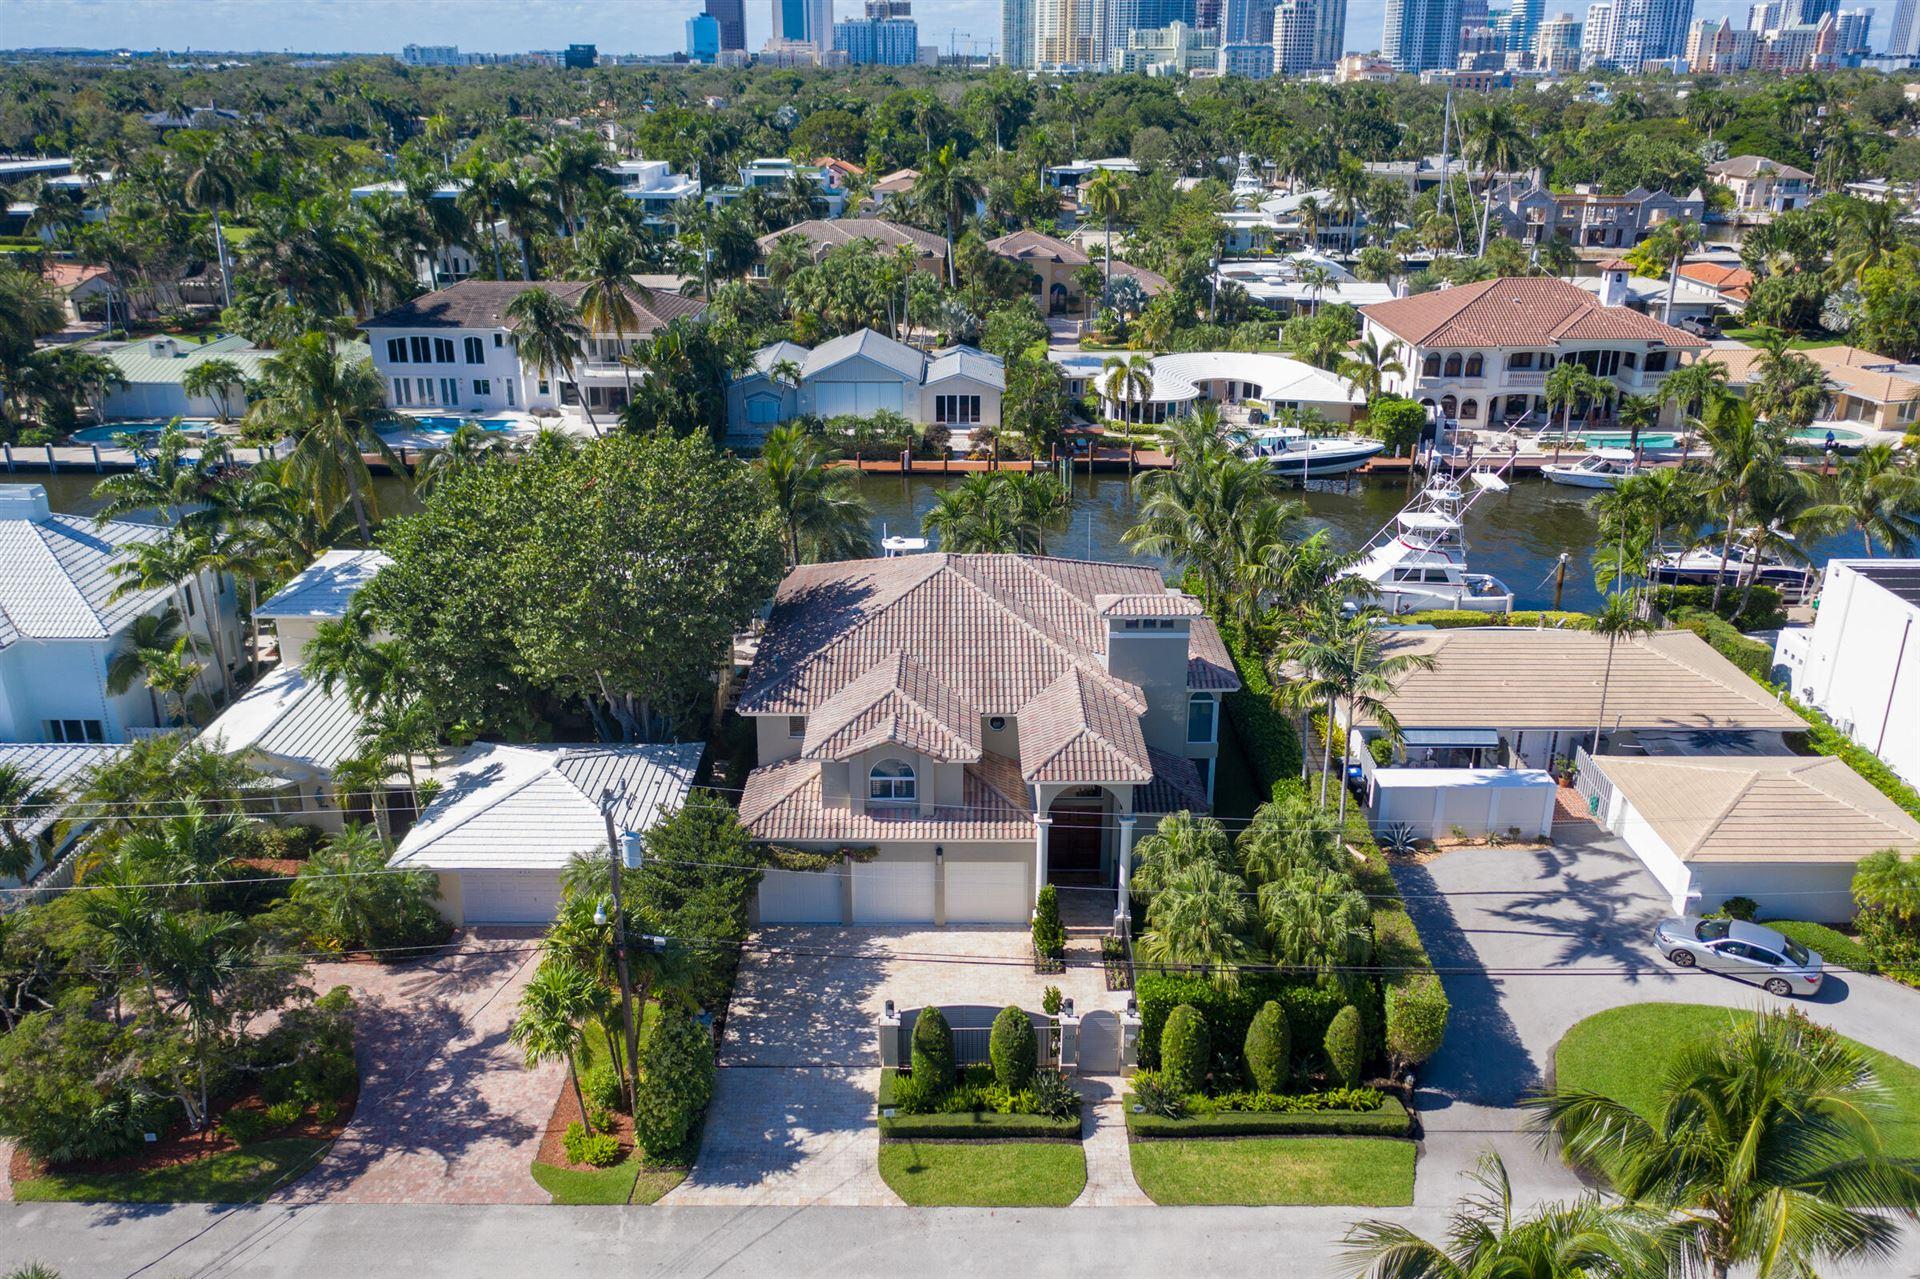 Photo of 433 Bontona Avenue, Fort Lauderdale, FL 33301 (MLS # RX-10731317)